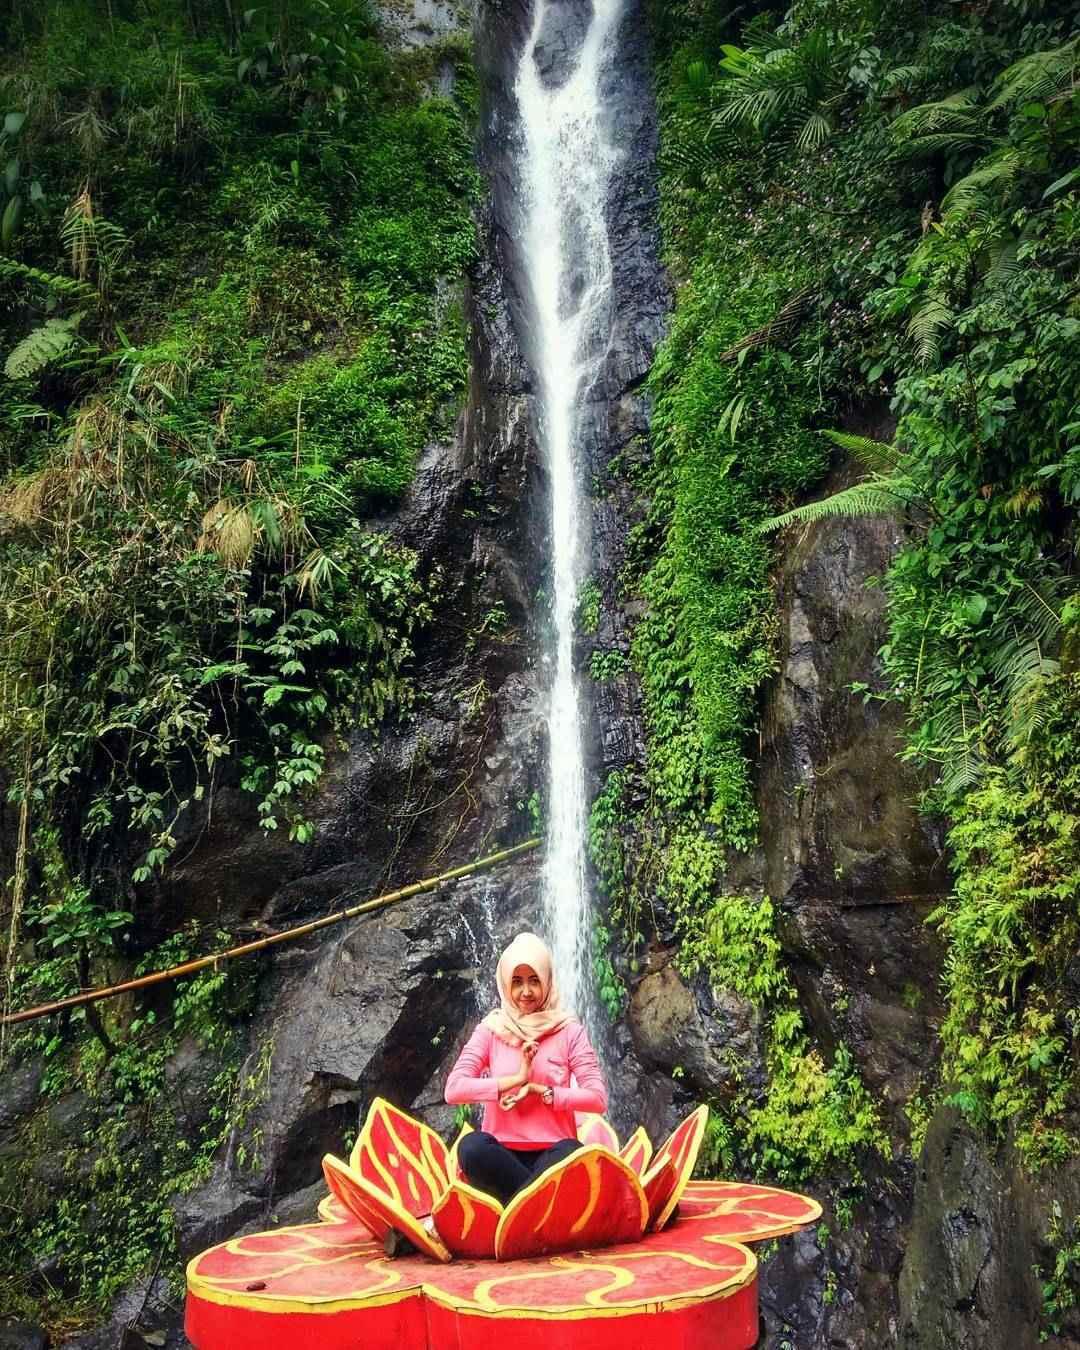 Akhir Pekan Seru Kampung Kurcaci Purbalingga Traveling Yuk Ruman Pohon